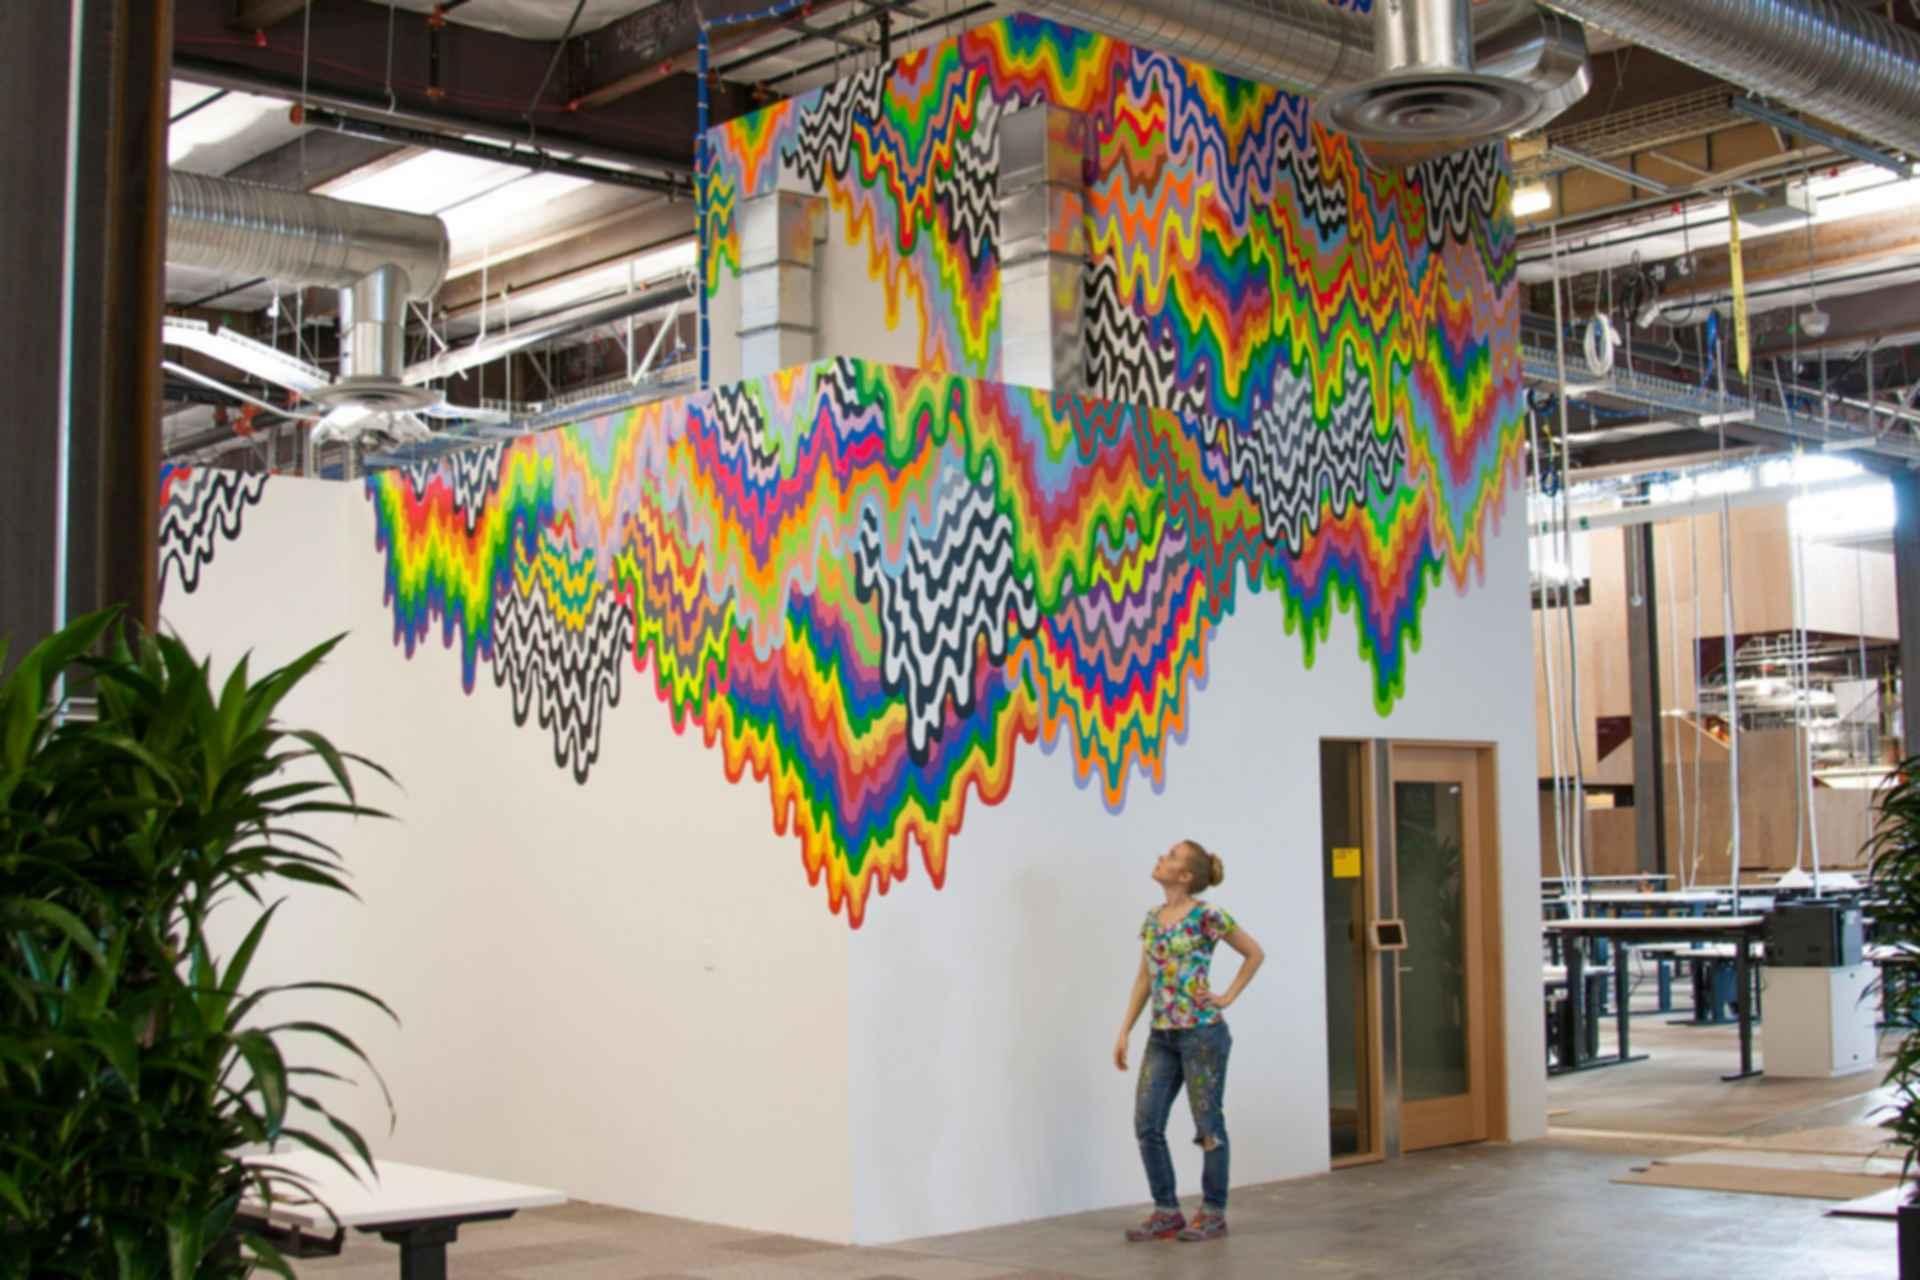 Facebook Headquarters Interior - Art Wall